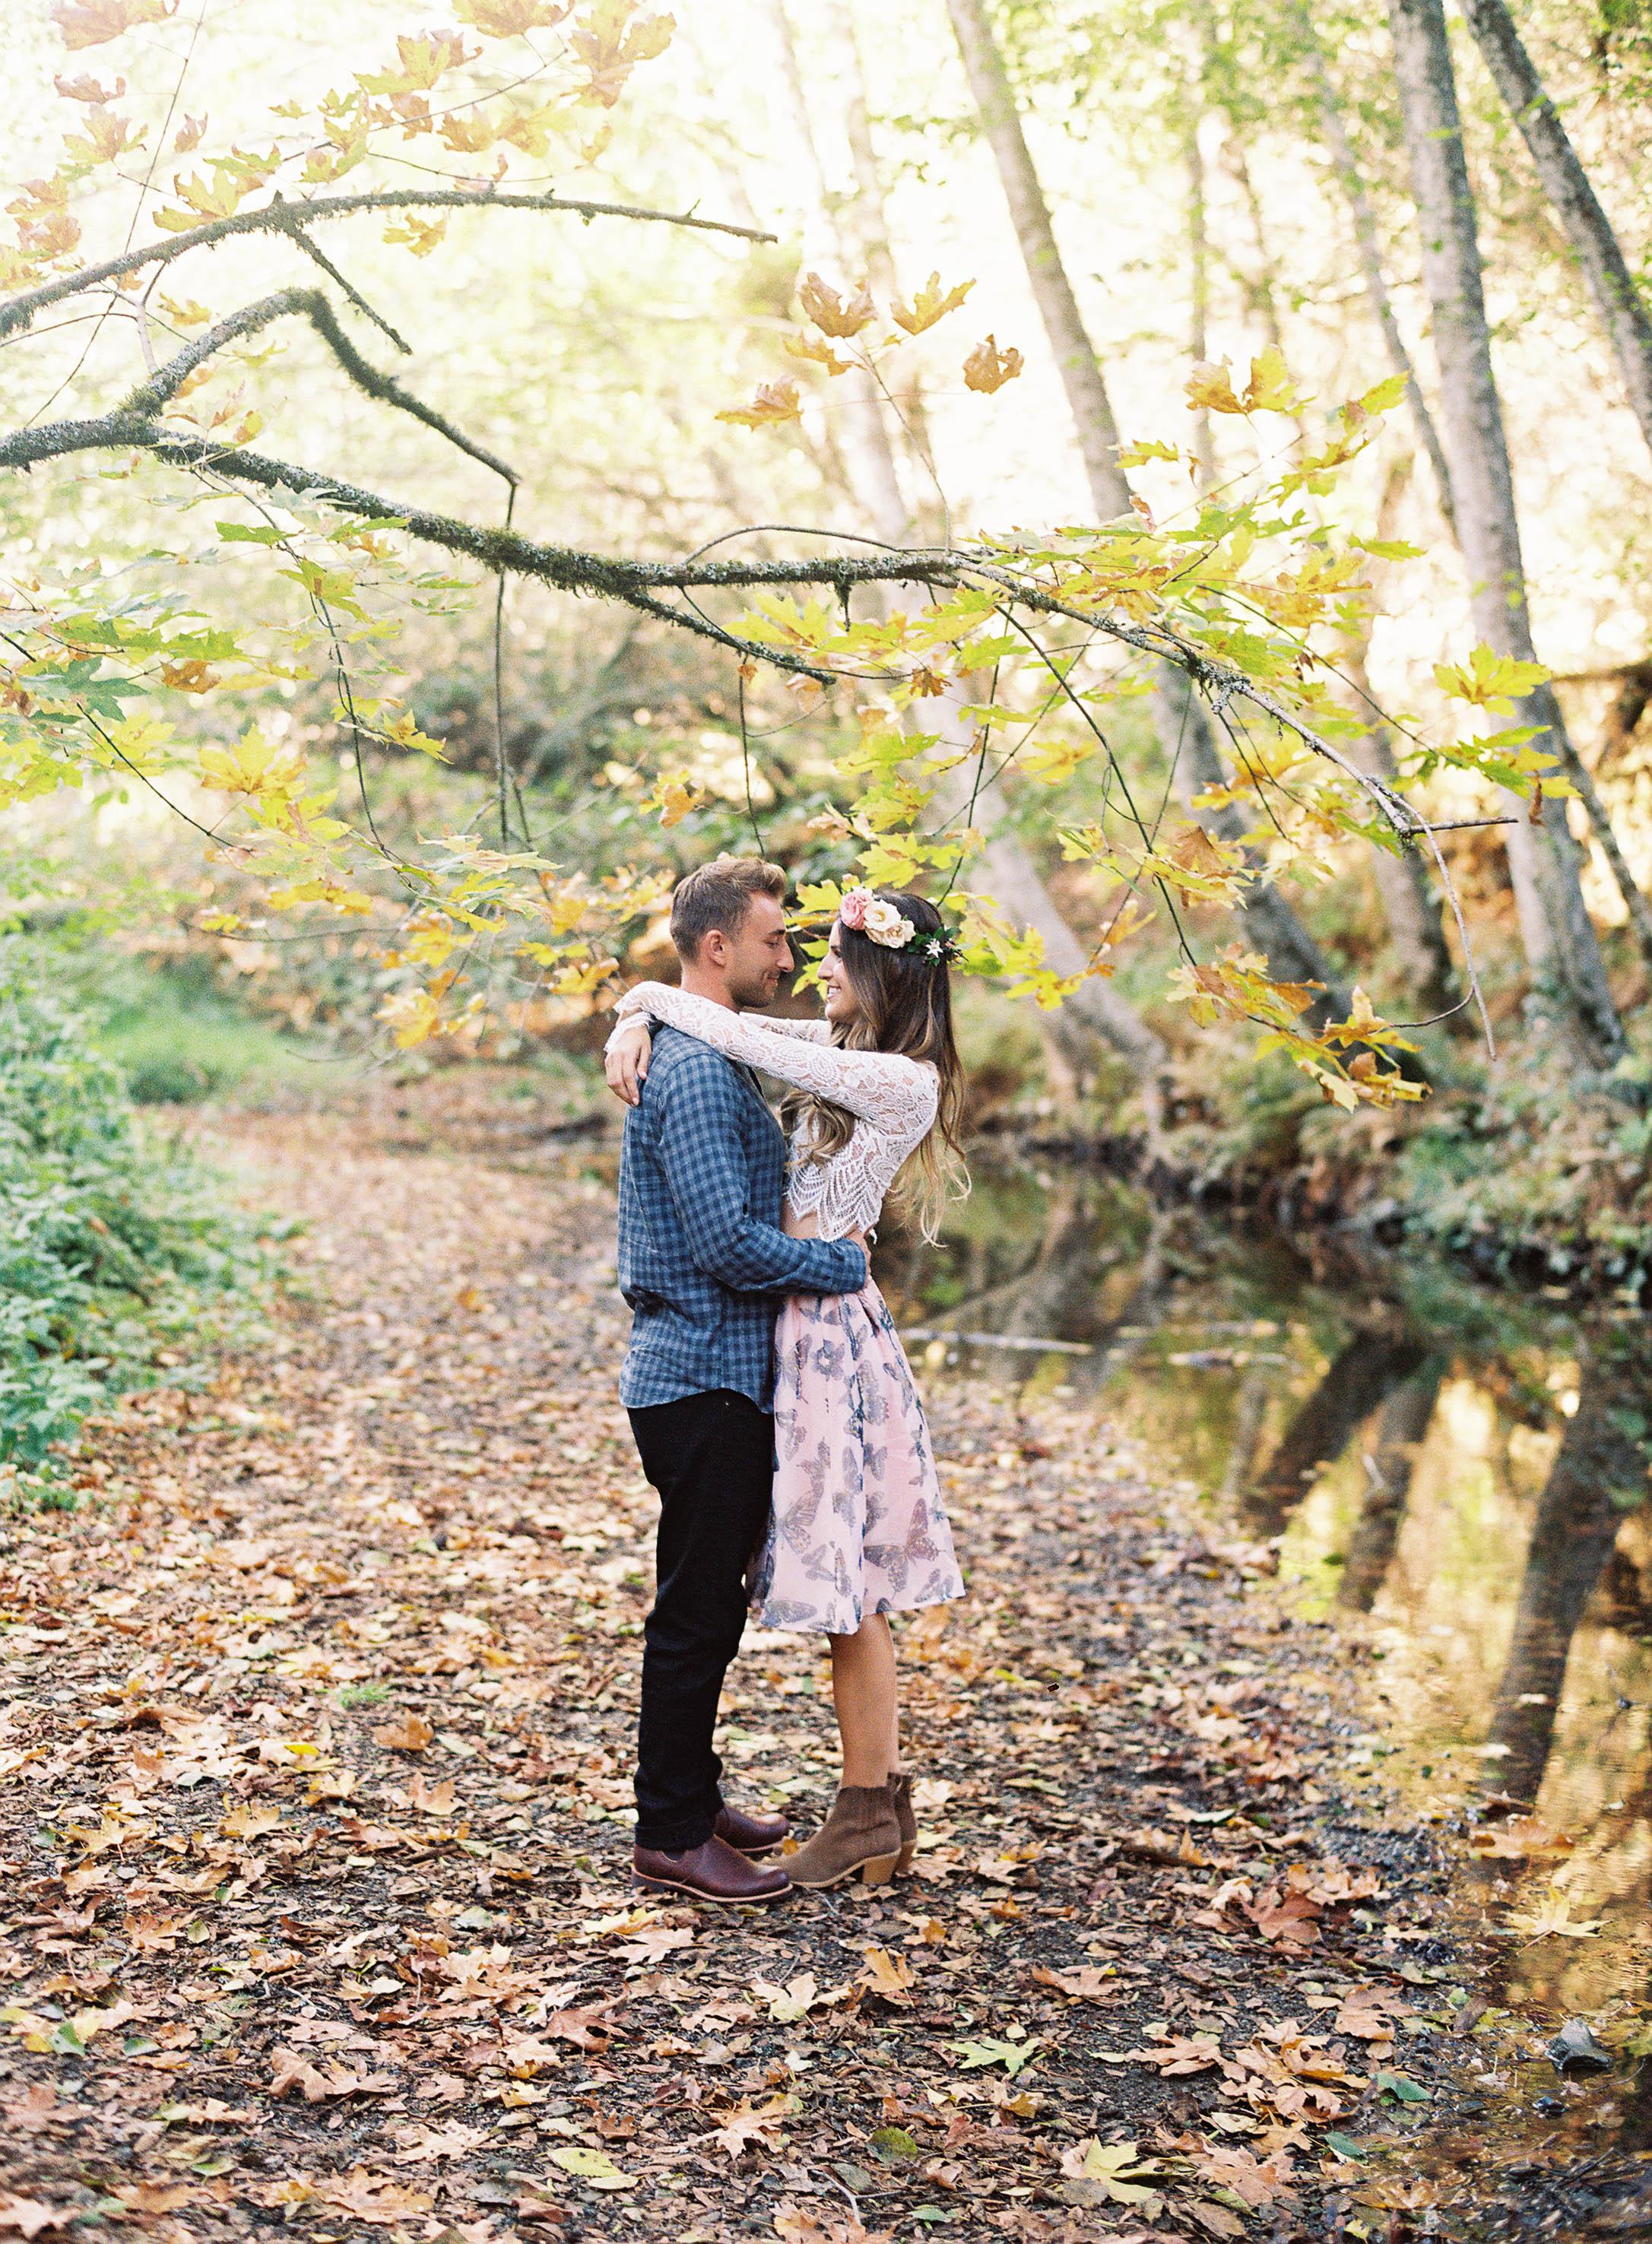 Meghan Mehan Photography - Fine Art Film Wedding Photography - San Francisco | Napa | Sonoma | Big Sur | Chicago | Minneapolis | Milwaukee | Lake Geneva | Door County | Wisconsin 046.jpg